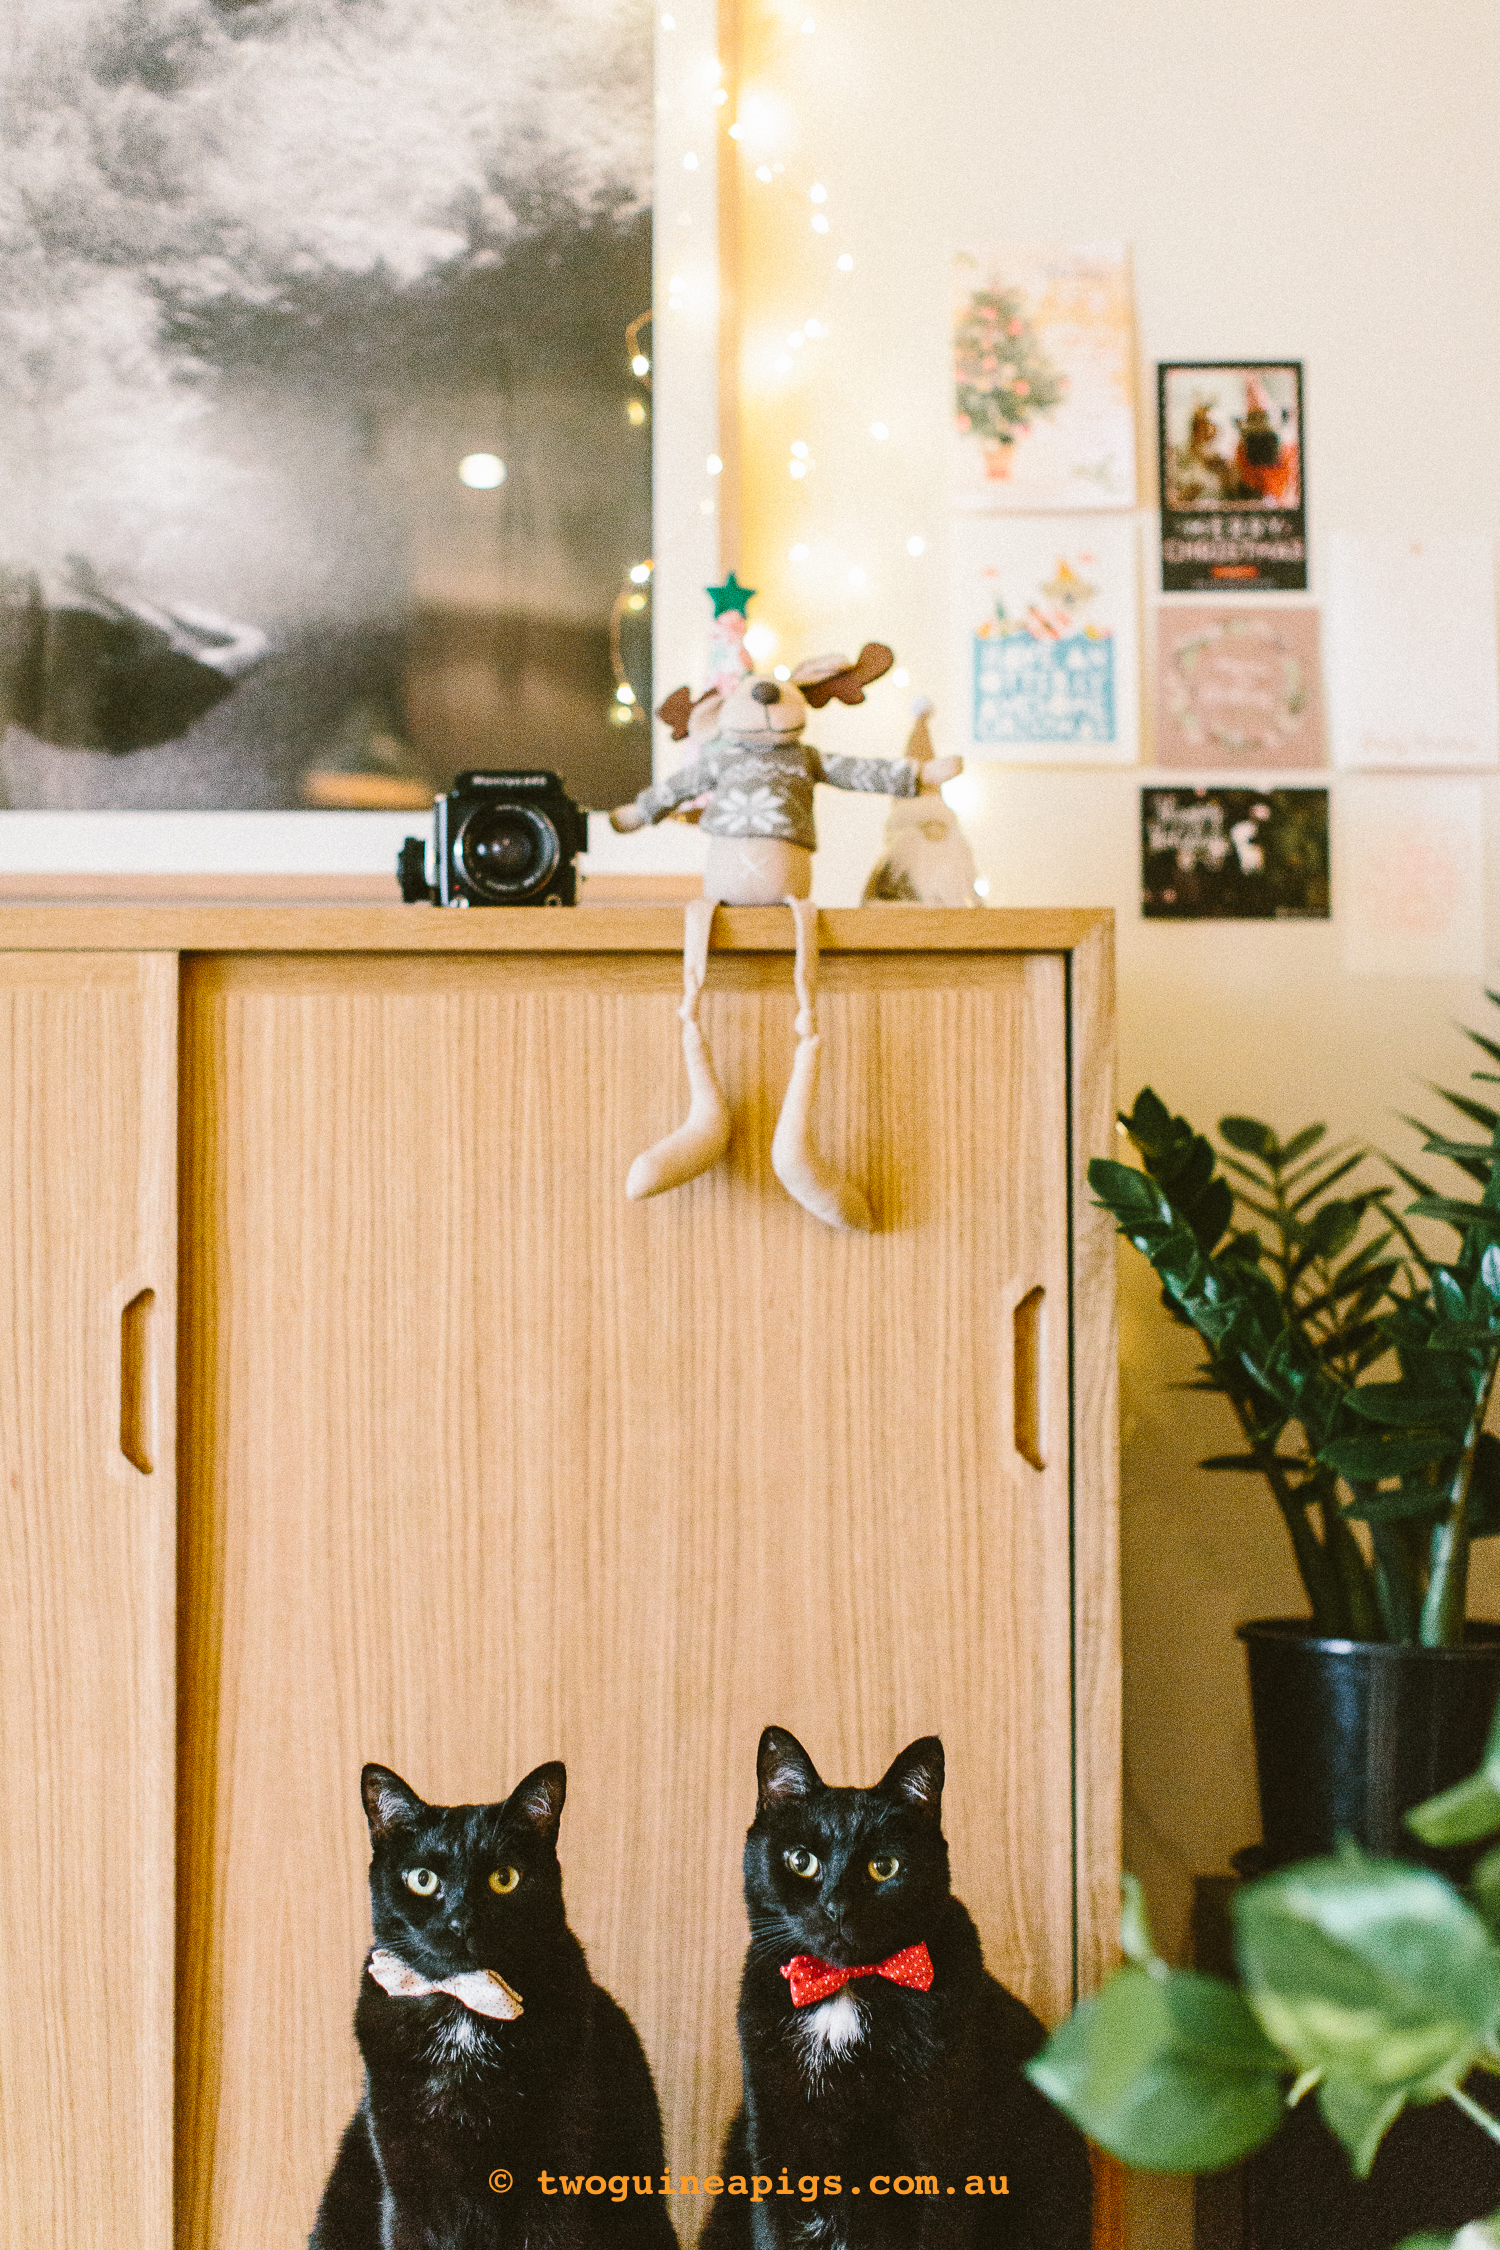 twoguineapigs_pet_photography_blackcats_interior